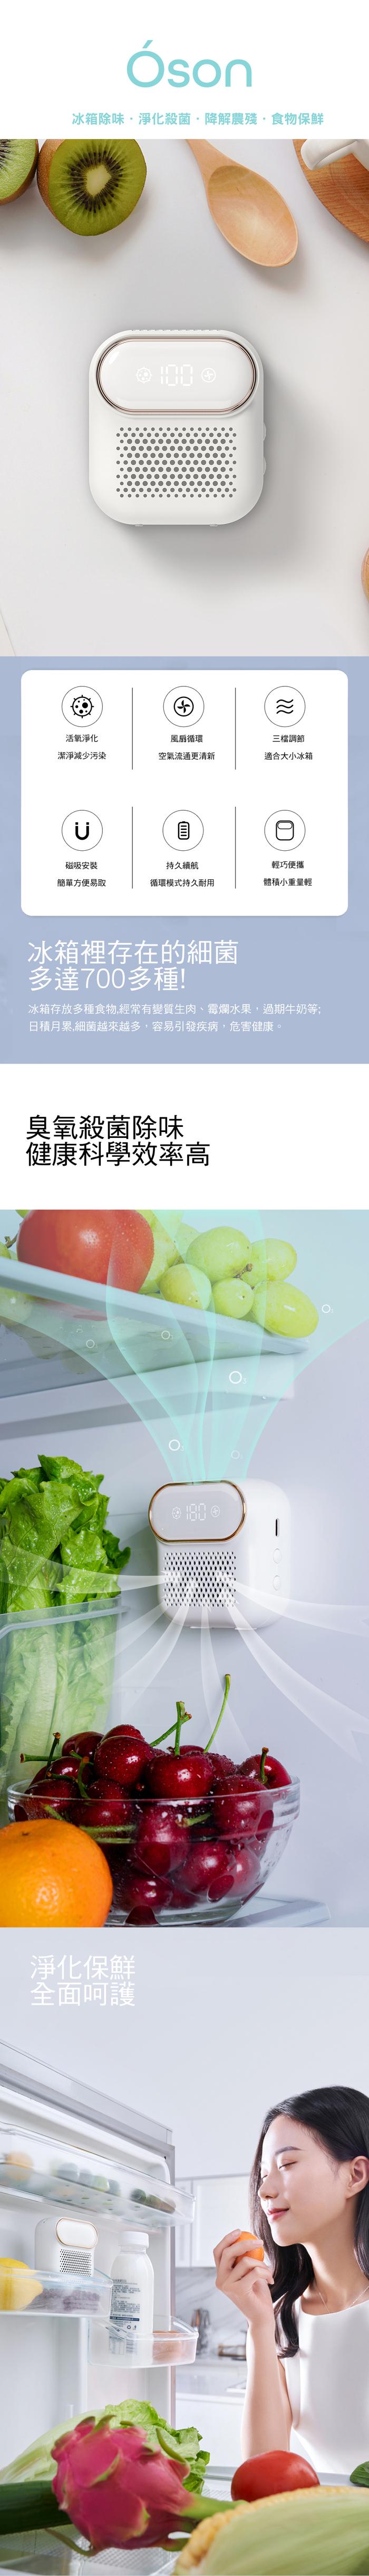 【集購】Amoovars OSON LED 多功能臭氧除味器(兩色任選)